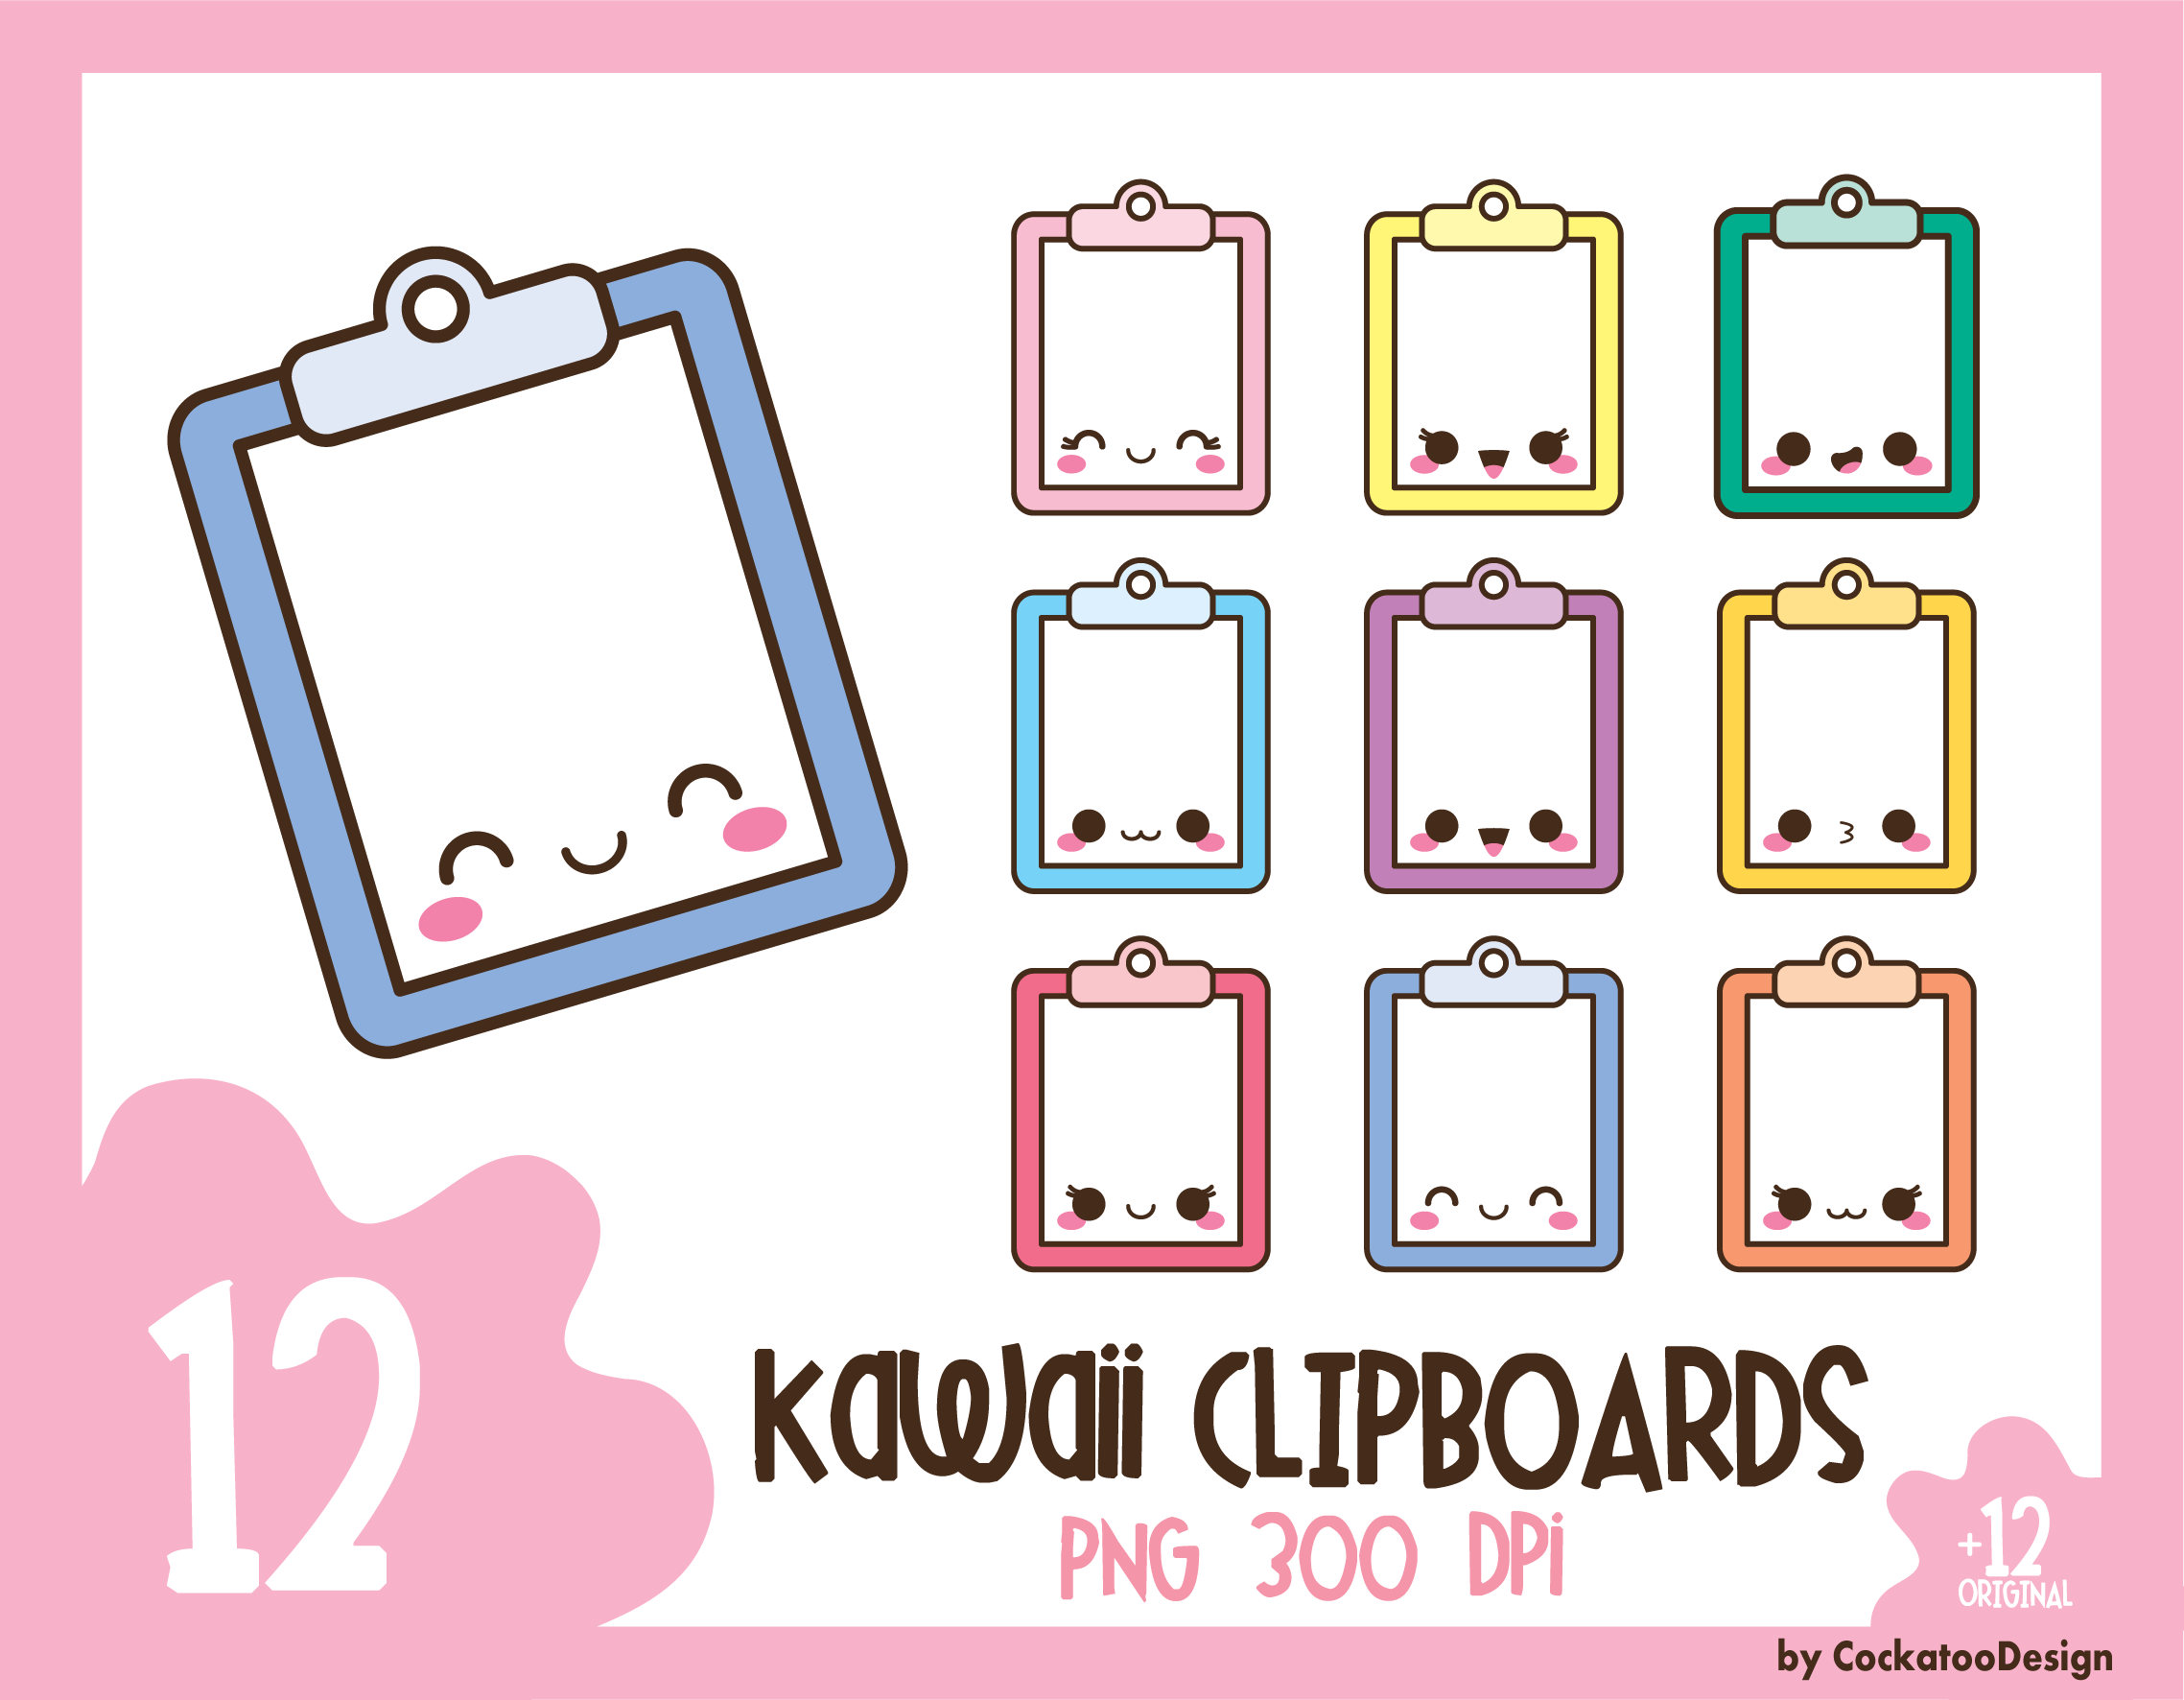 Clipboard clipart cute. Kawaii clip art planner